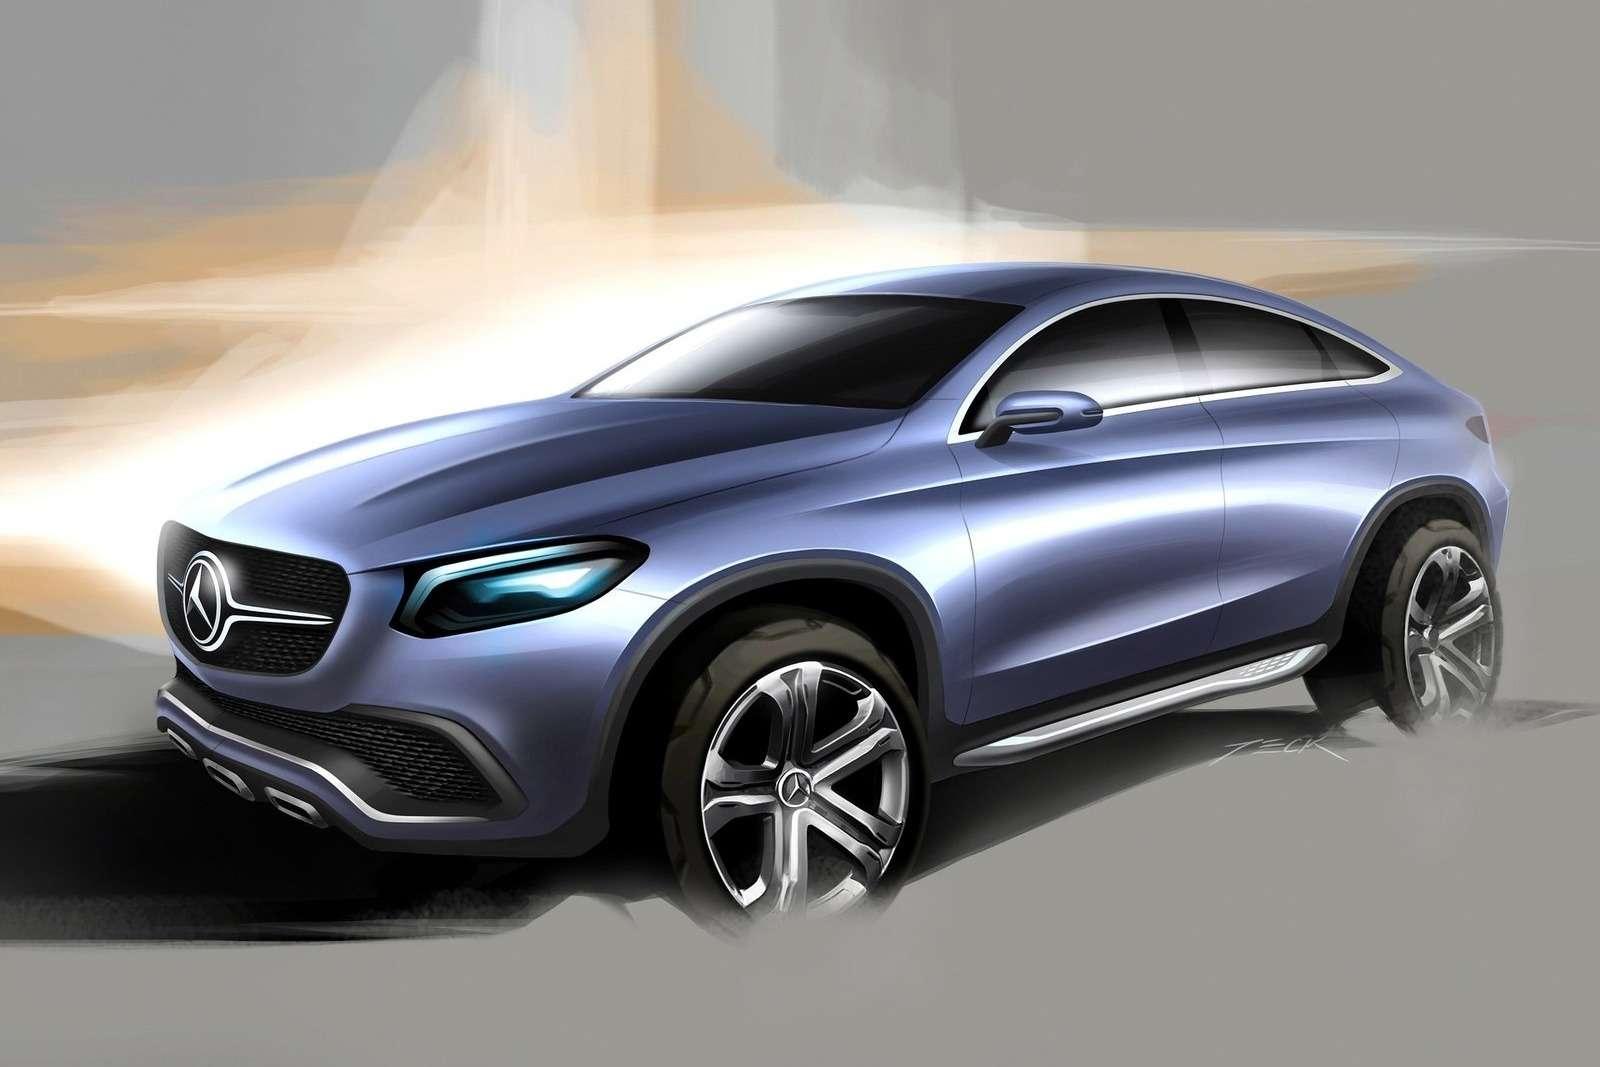 Mercedes-Benz-Coupe_SUV_Concept_2014_1600x1200_wallpaper_21